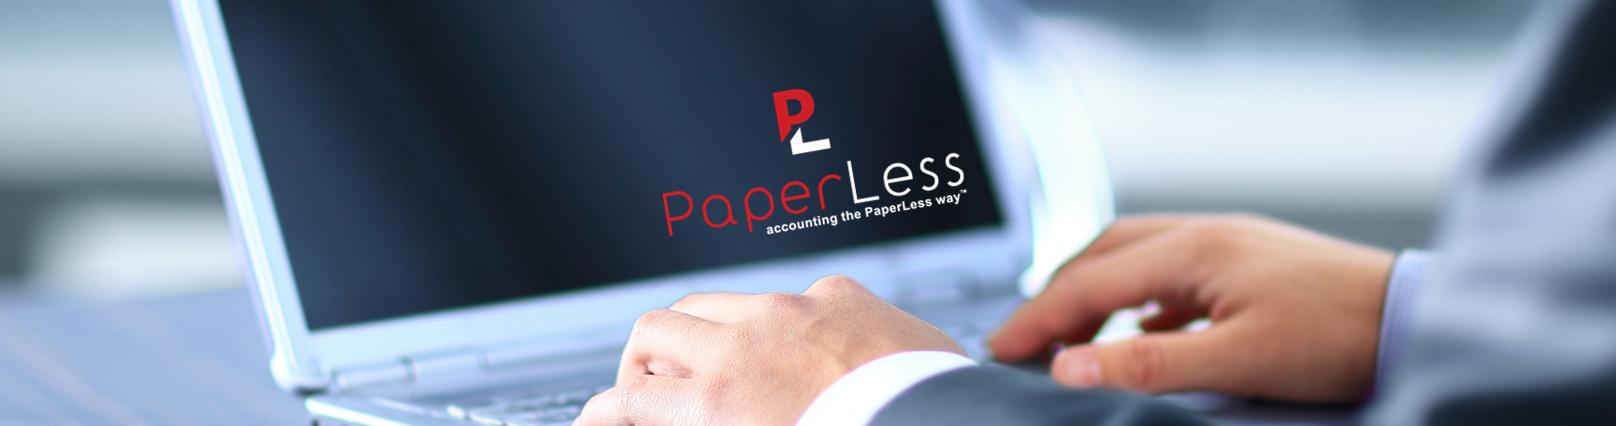 PaperLess Document Management Case Studies